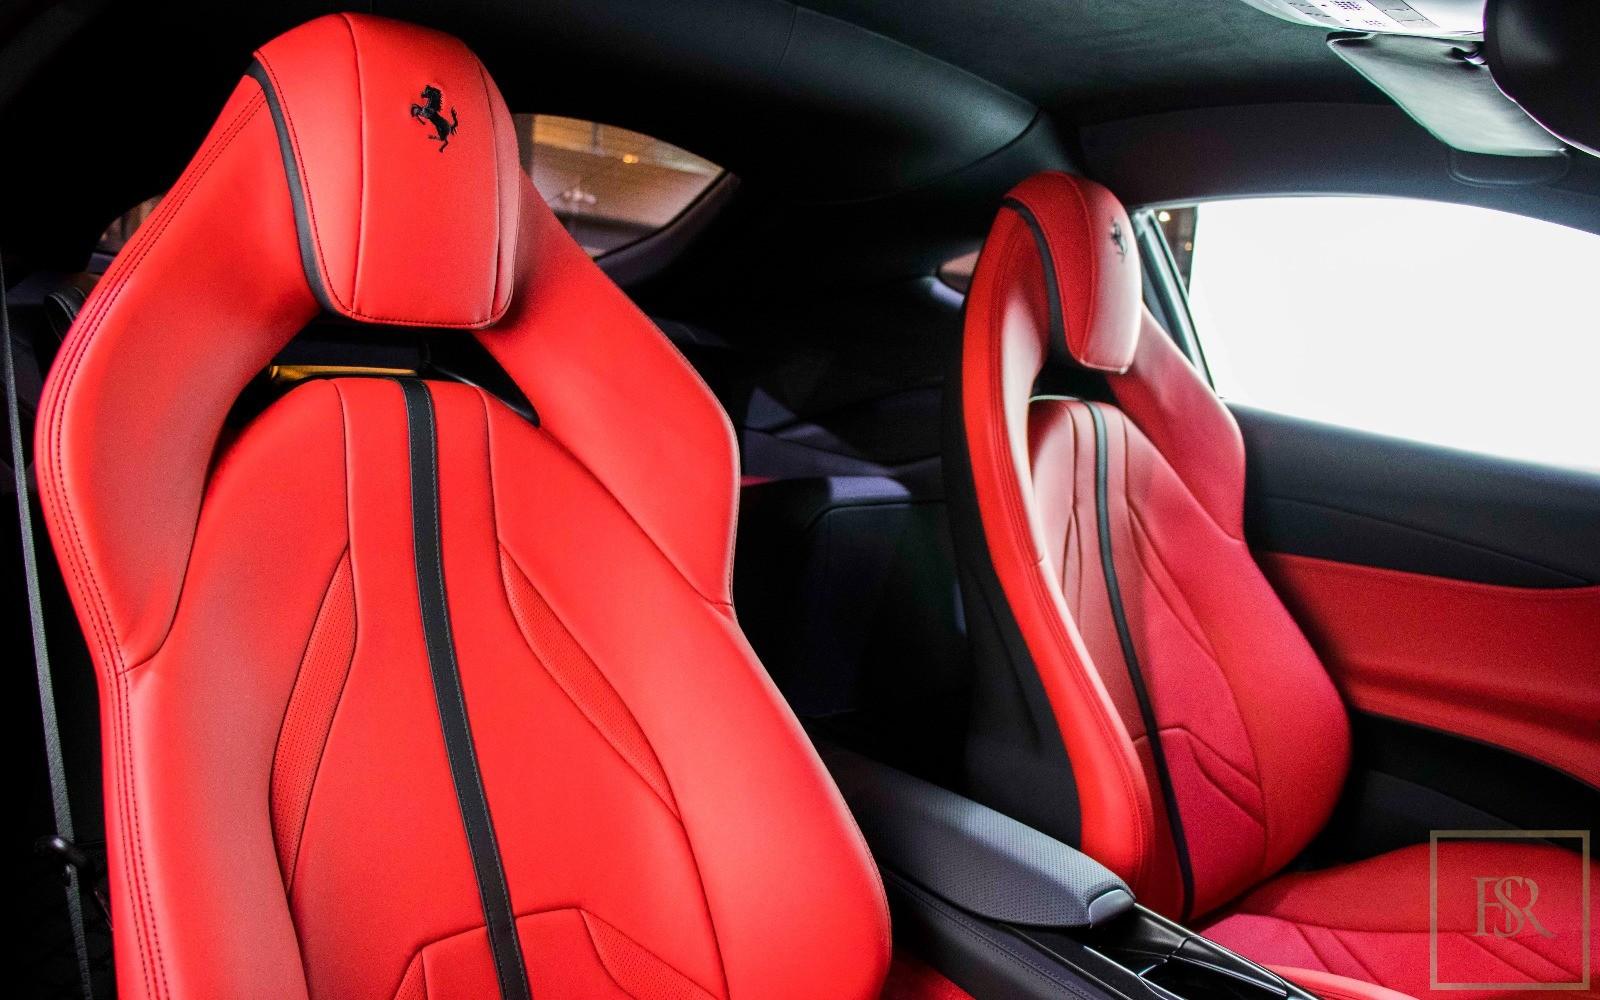 New Exotic 2019 Ferrari 812 Superfast Black 95km For Sale For Super Rich